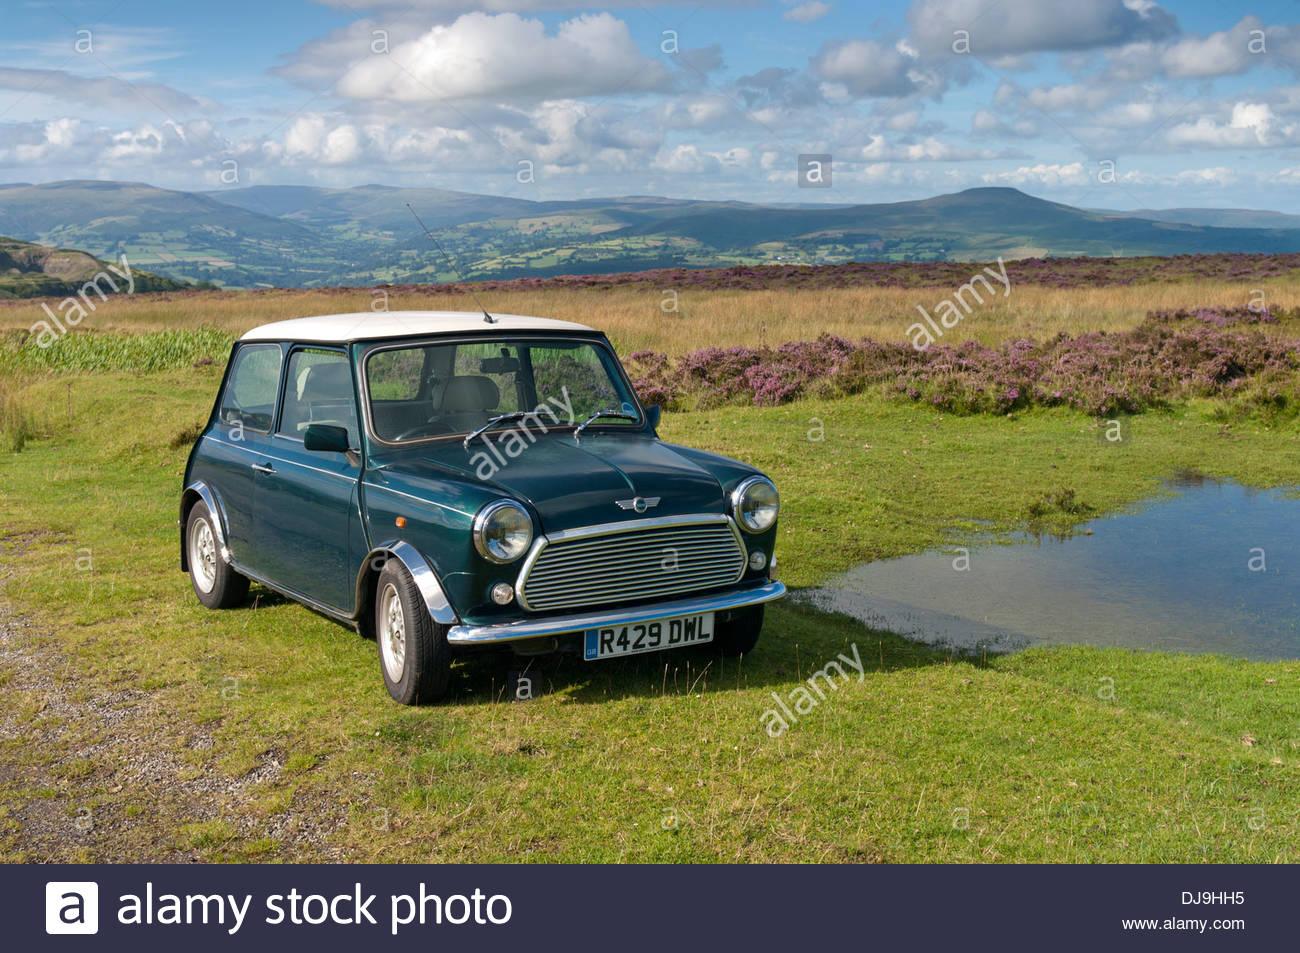 Rover Mini coche en el paisaje Imagen De Stock